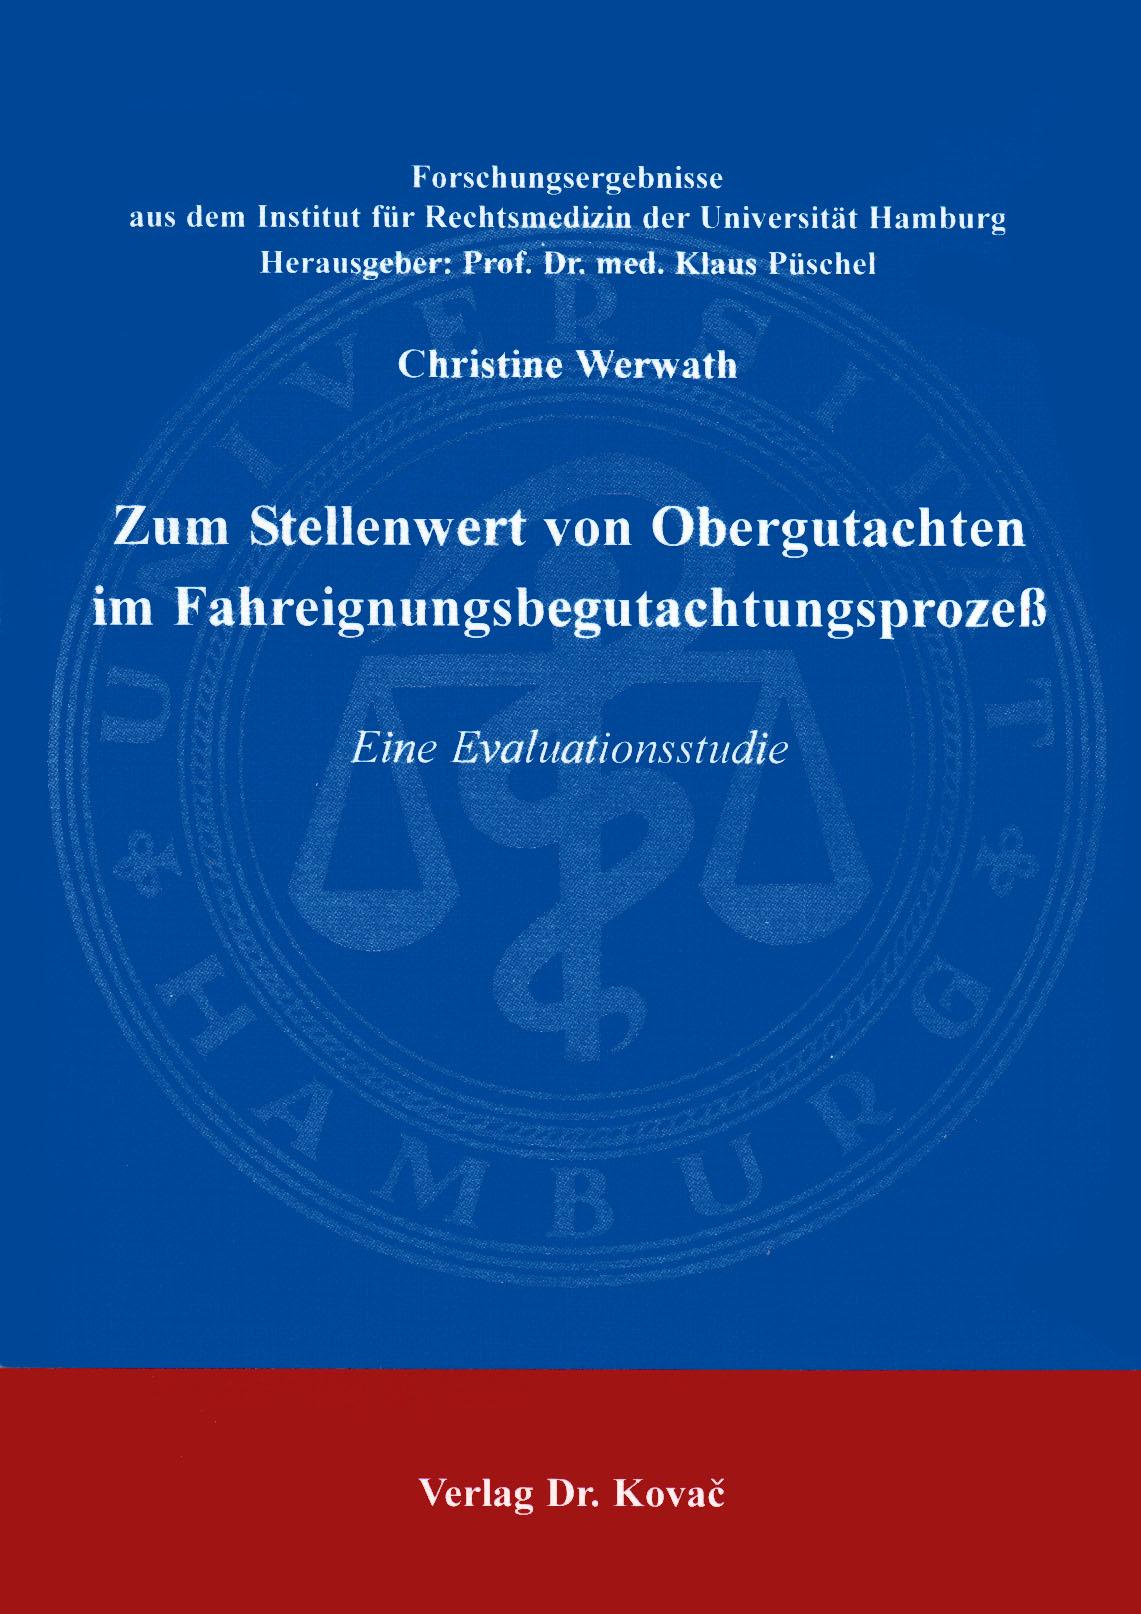 Cover: Zum Stellenwert von Obergutachten im Fahreignungsbegutachtungsprozeß